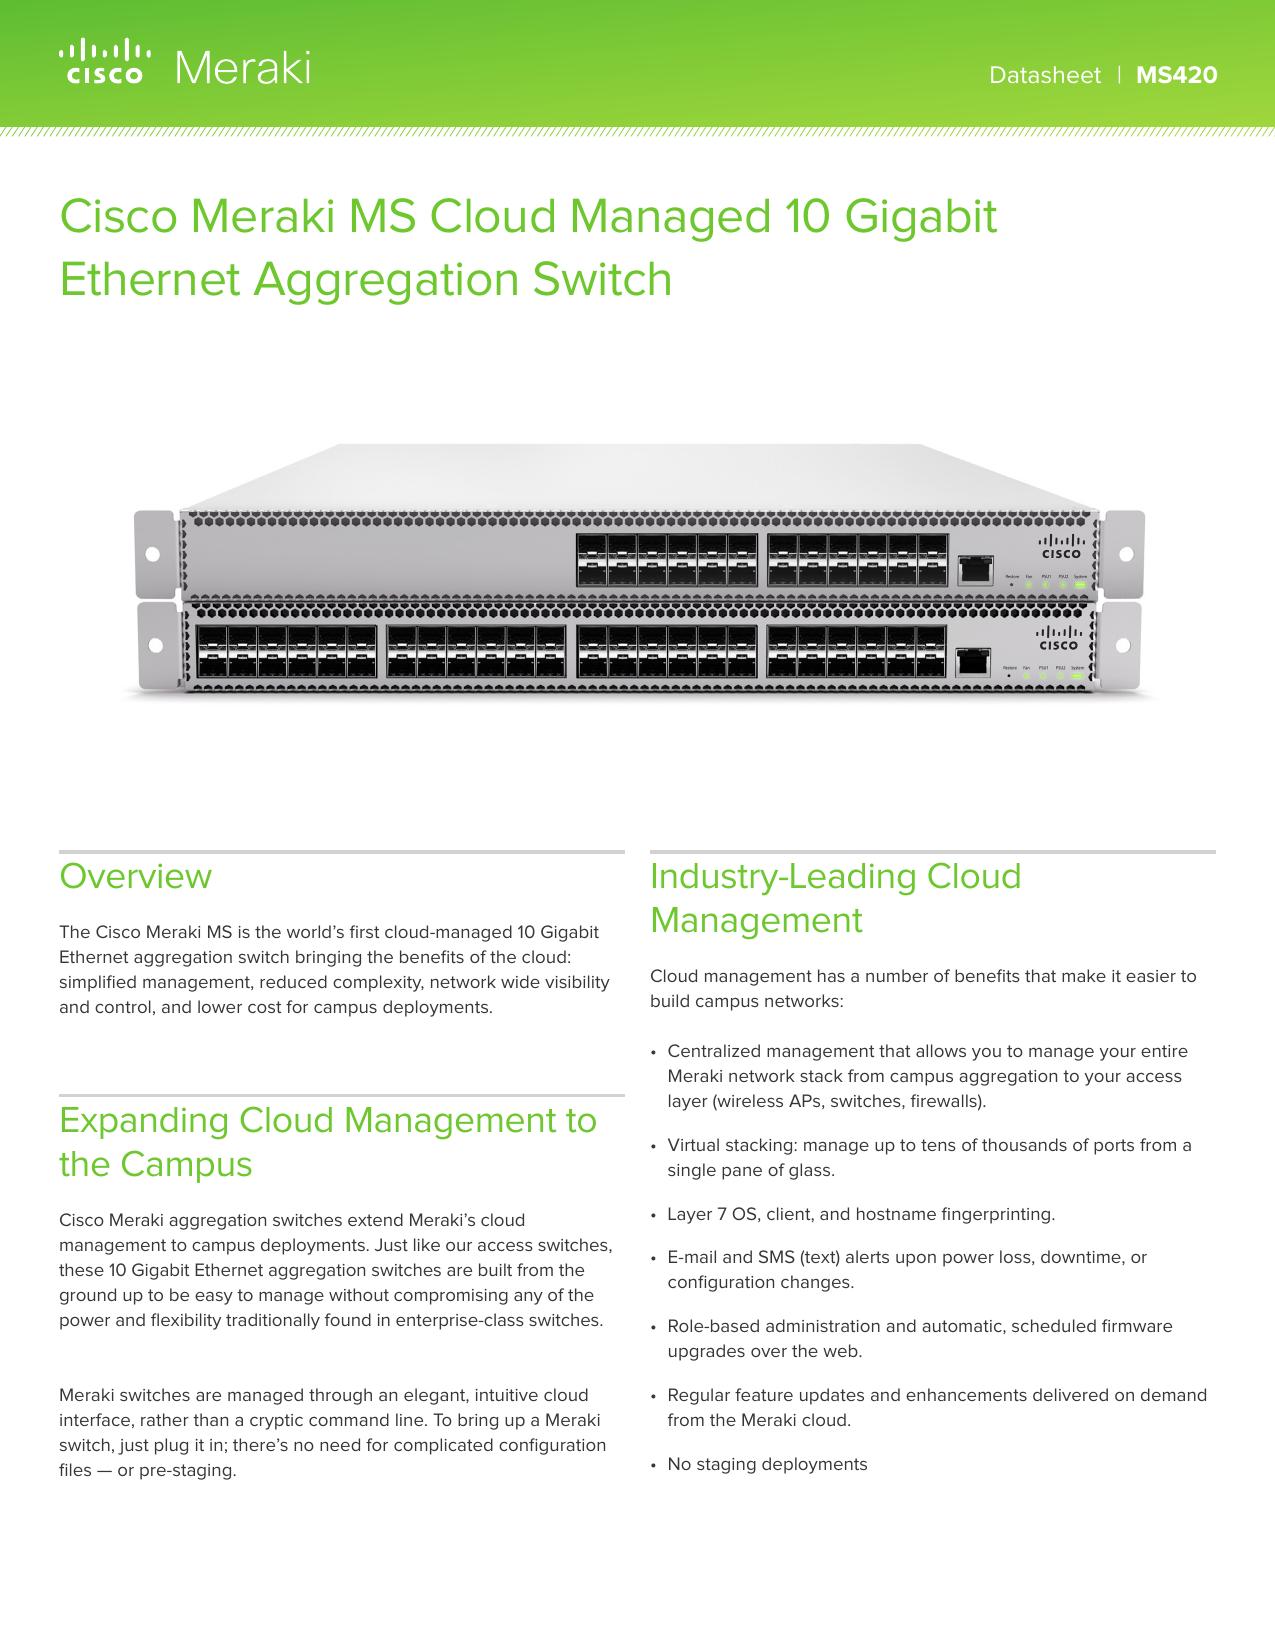 Cisco Meraki MS Cloud Managed 10 Gigabit Ethernet